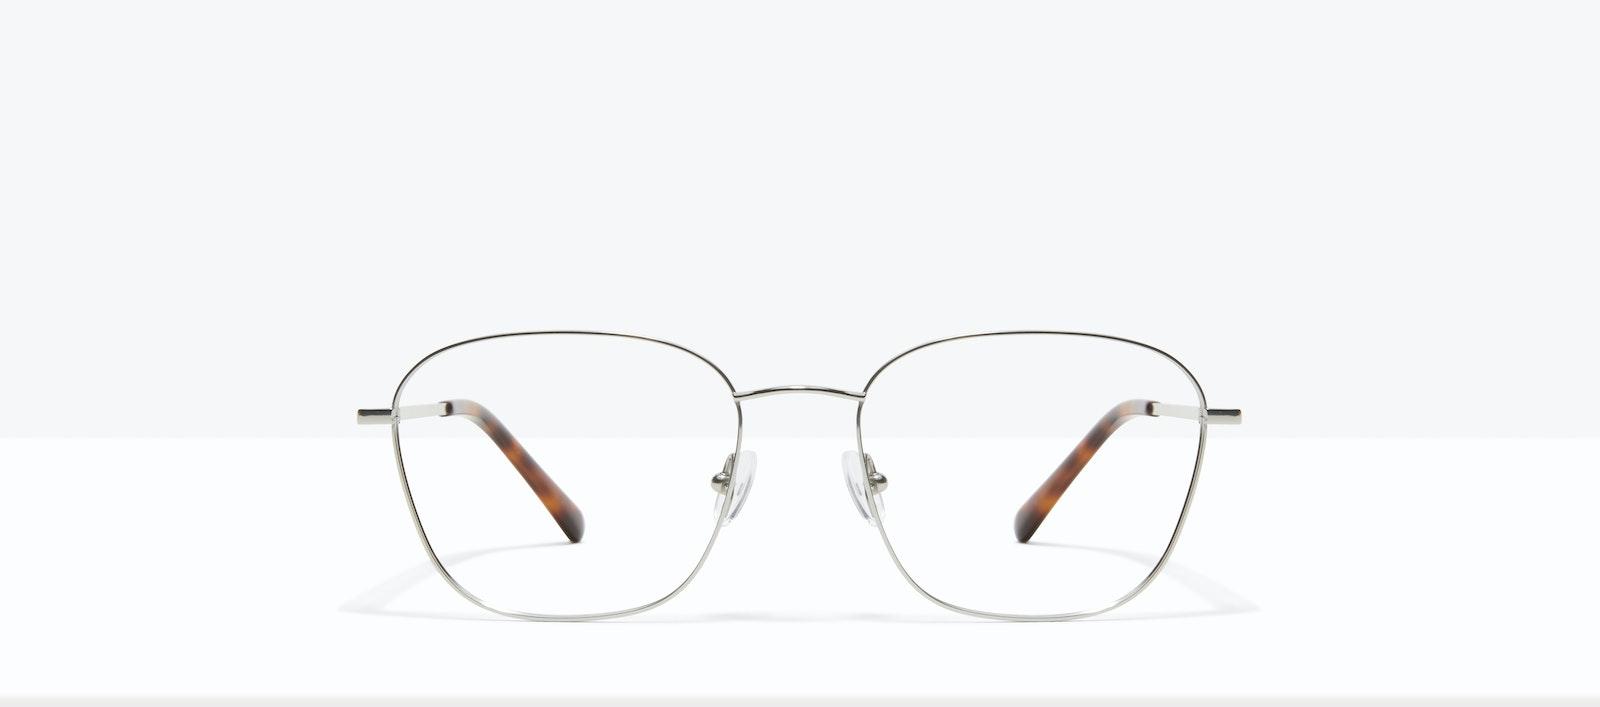 Affordable Fashion Glasses Square Eyeglasses Women Lane Platinum Front